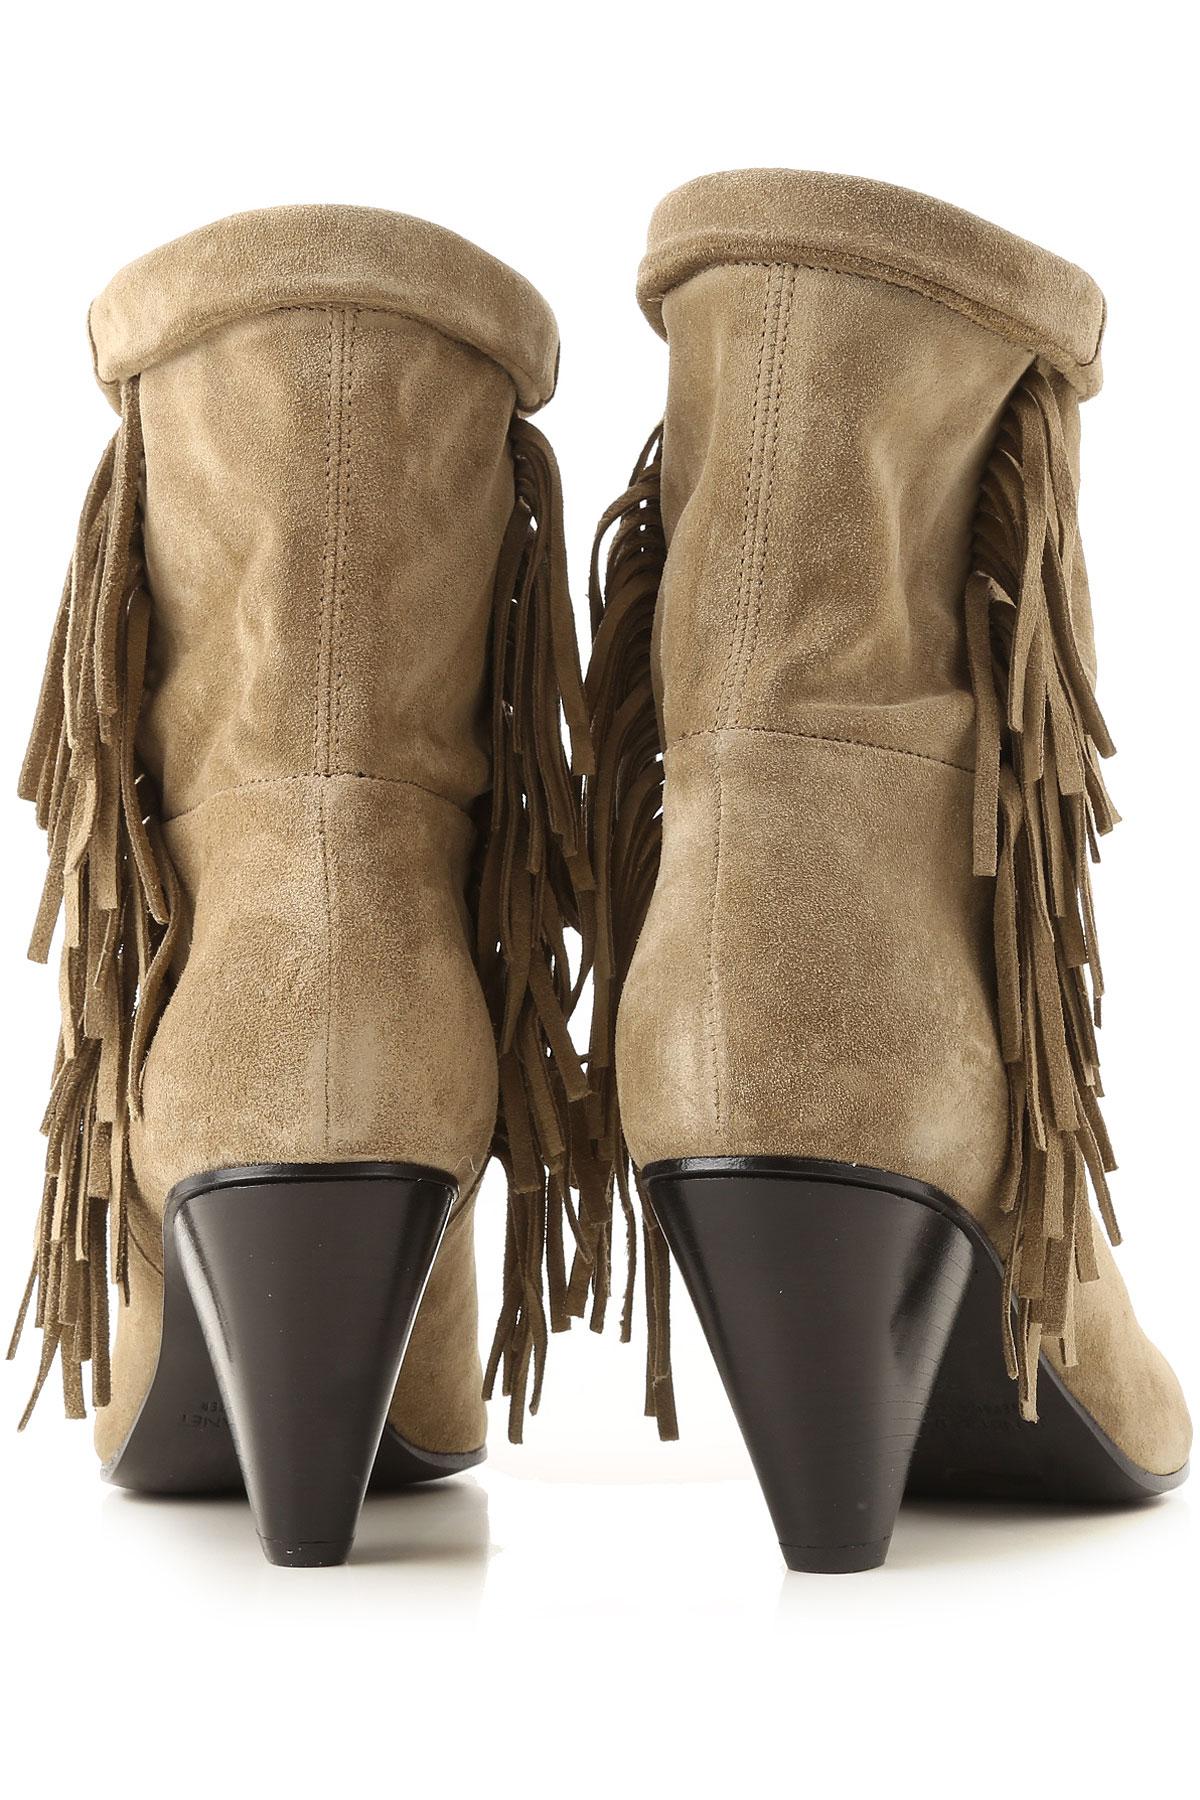 Mujer Caqui amp; Primavera Para 2019 nbsp; Zapatos Janet verano t0zxqBdHtw